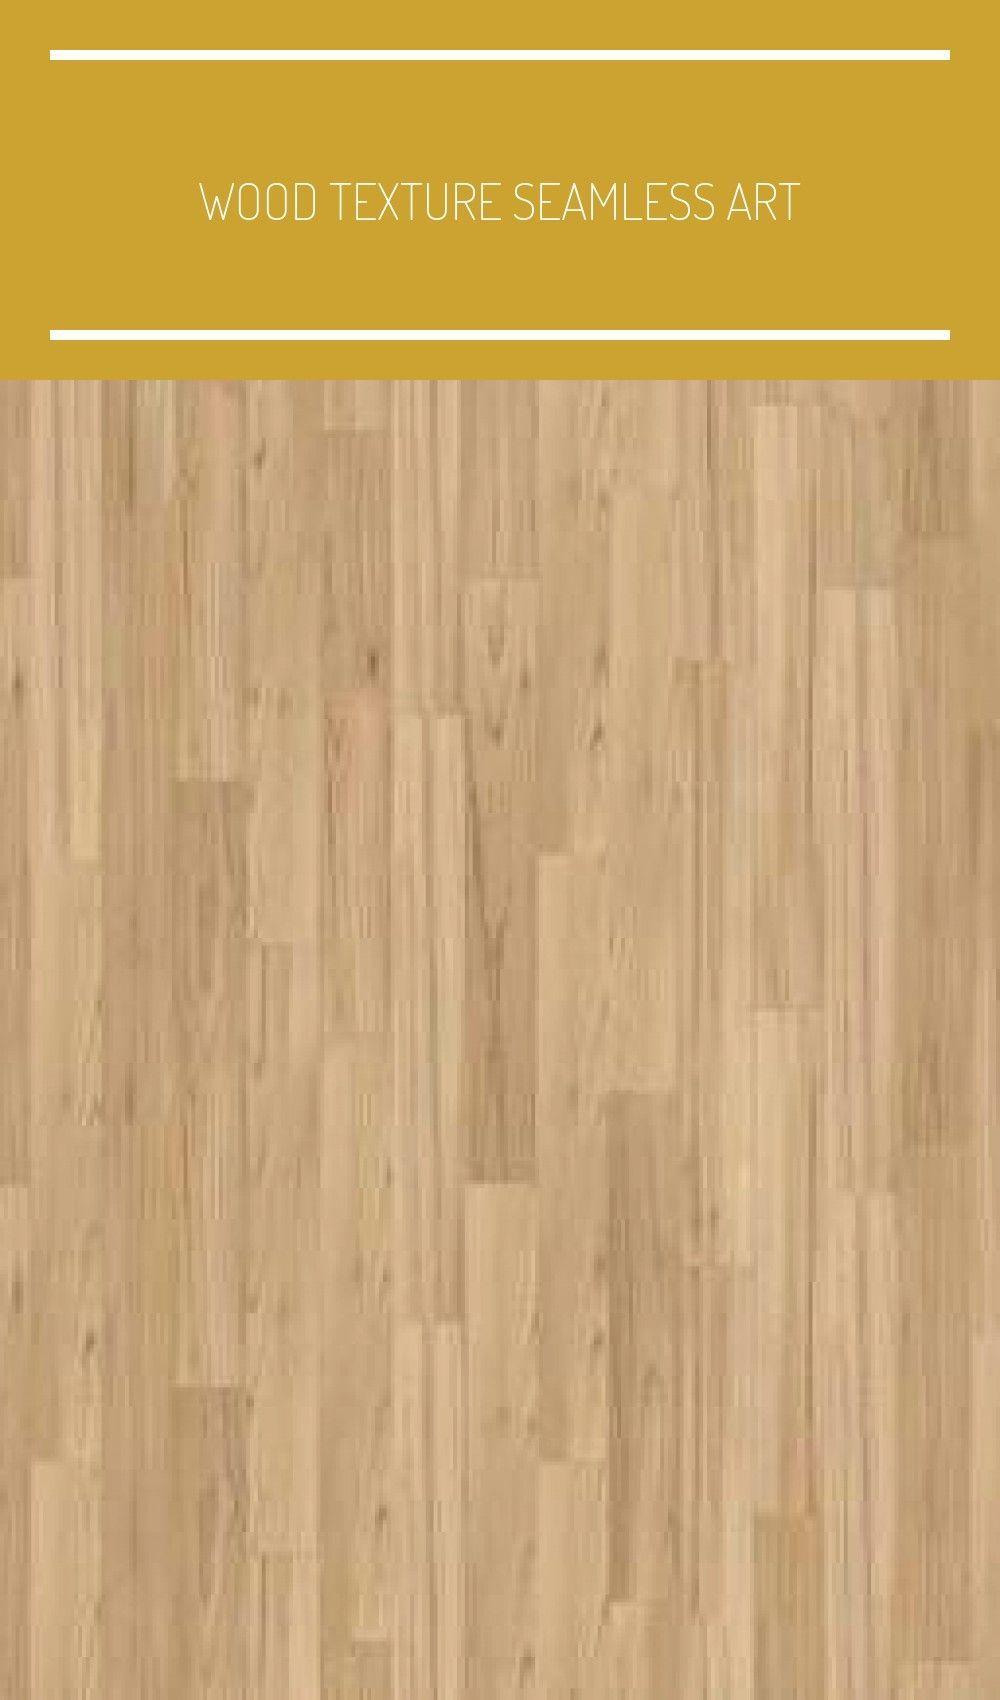 Wood Texture Seamless Art 54+ Ideas For 2019 #woodtextureseamless Wood Texture S ...  Wood texture seamless art 54+ ideas for 2019 #woodtextureseamless Wood texture seamless art 54+ ide #Art #Ideas #SEAMLESS #TEXTURE #wood #woodtextureseamless #pavimenti in 3d #woodtextureseamless Wood Texture Seamless Art 54+ Ideas For 2019 #woodtextureseamless Wood Texture S ...  Wood texture seamless art 54+ ideas for 2019 #woodtextureseamless Wood texture seamless art 54+ ide #Art #Ideas #SEAMLESS #TEXTURE # #woodtextureseamless